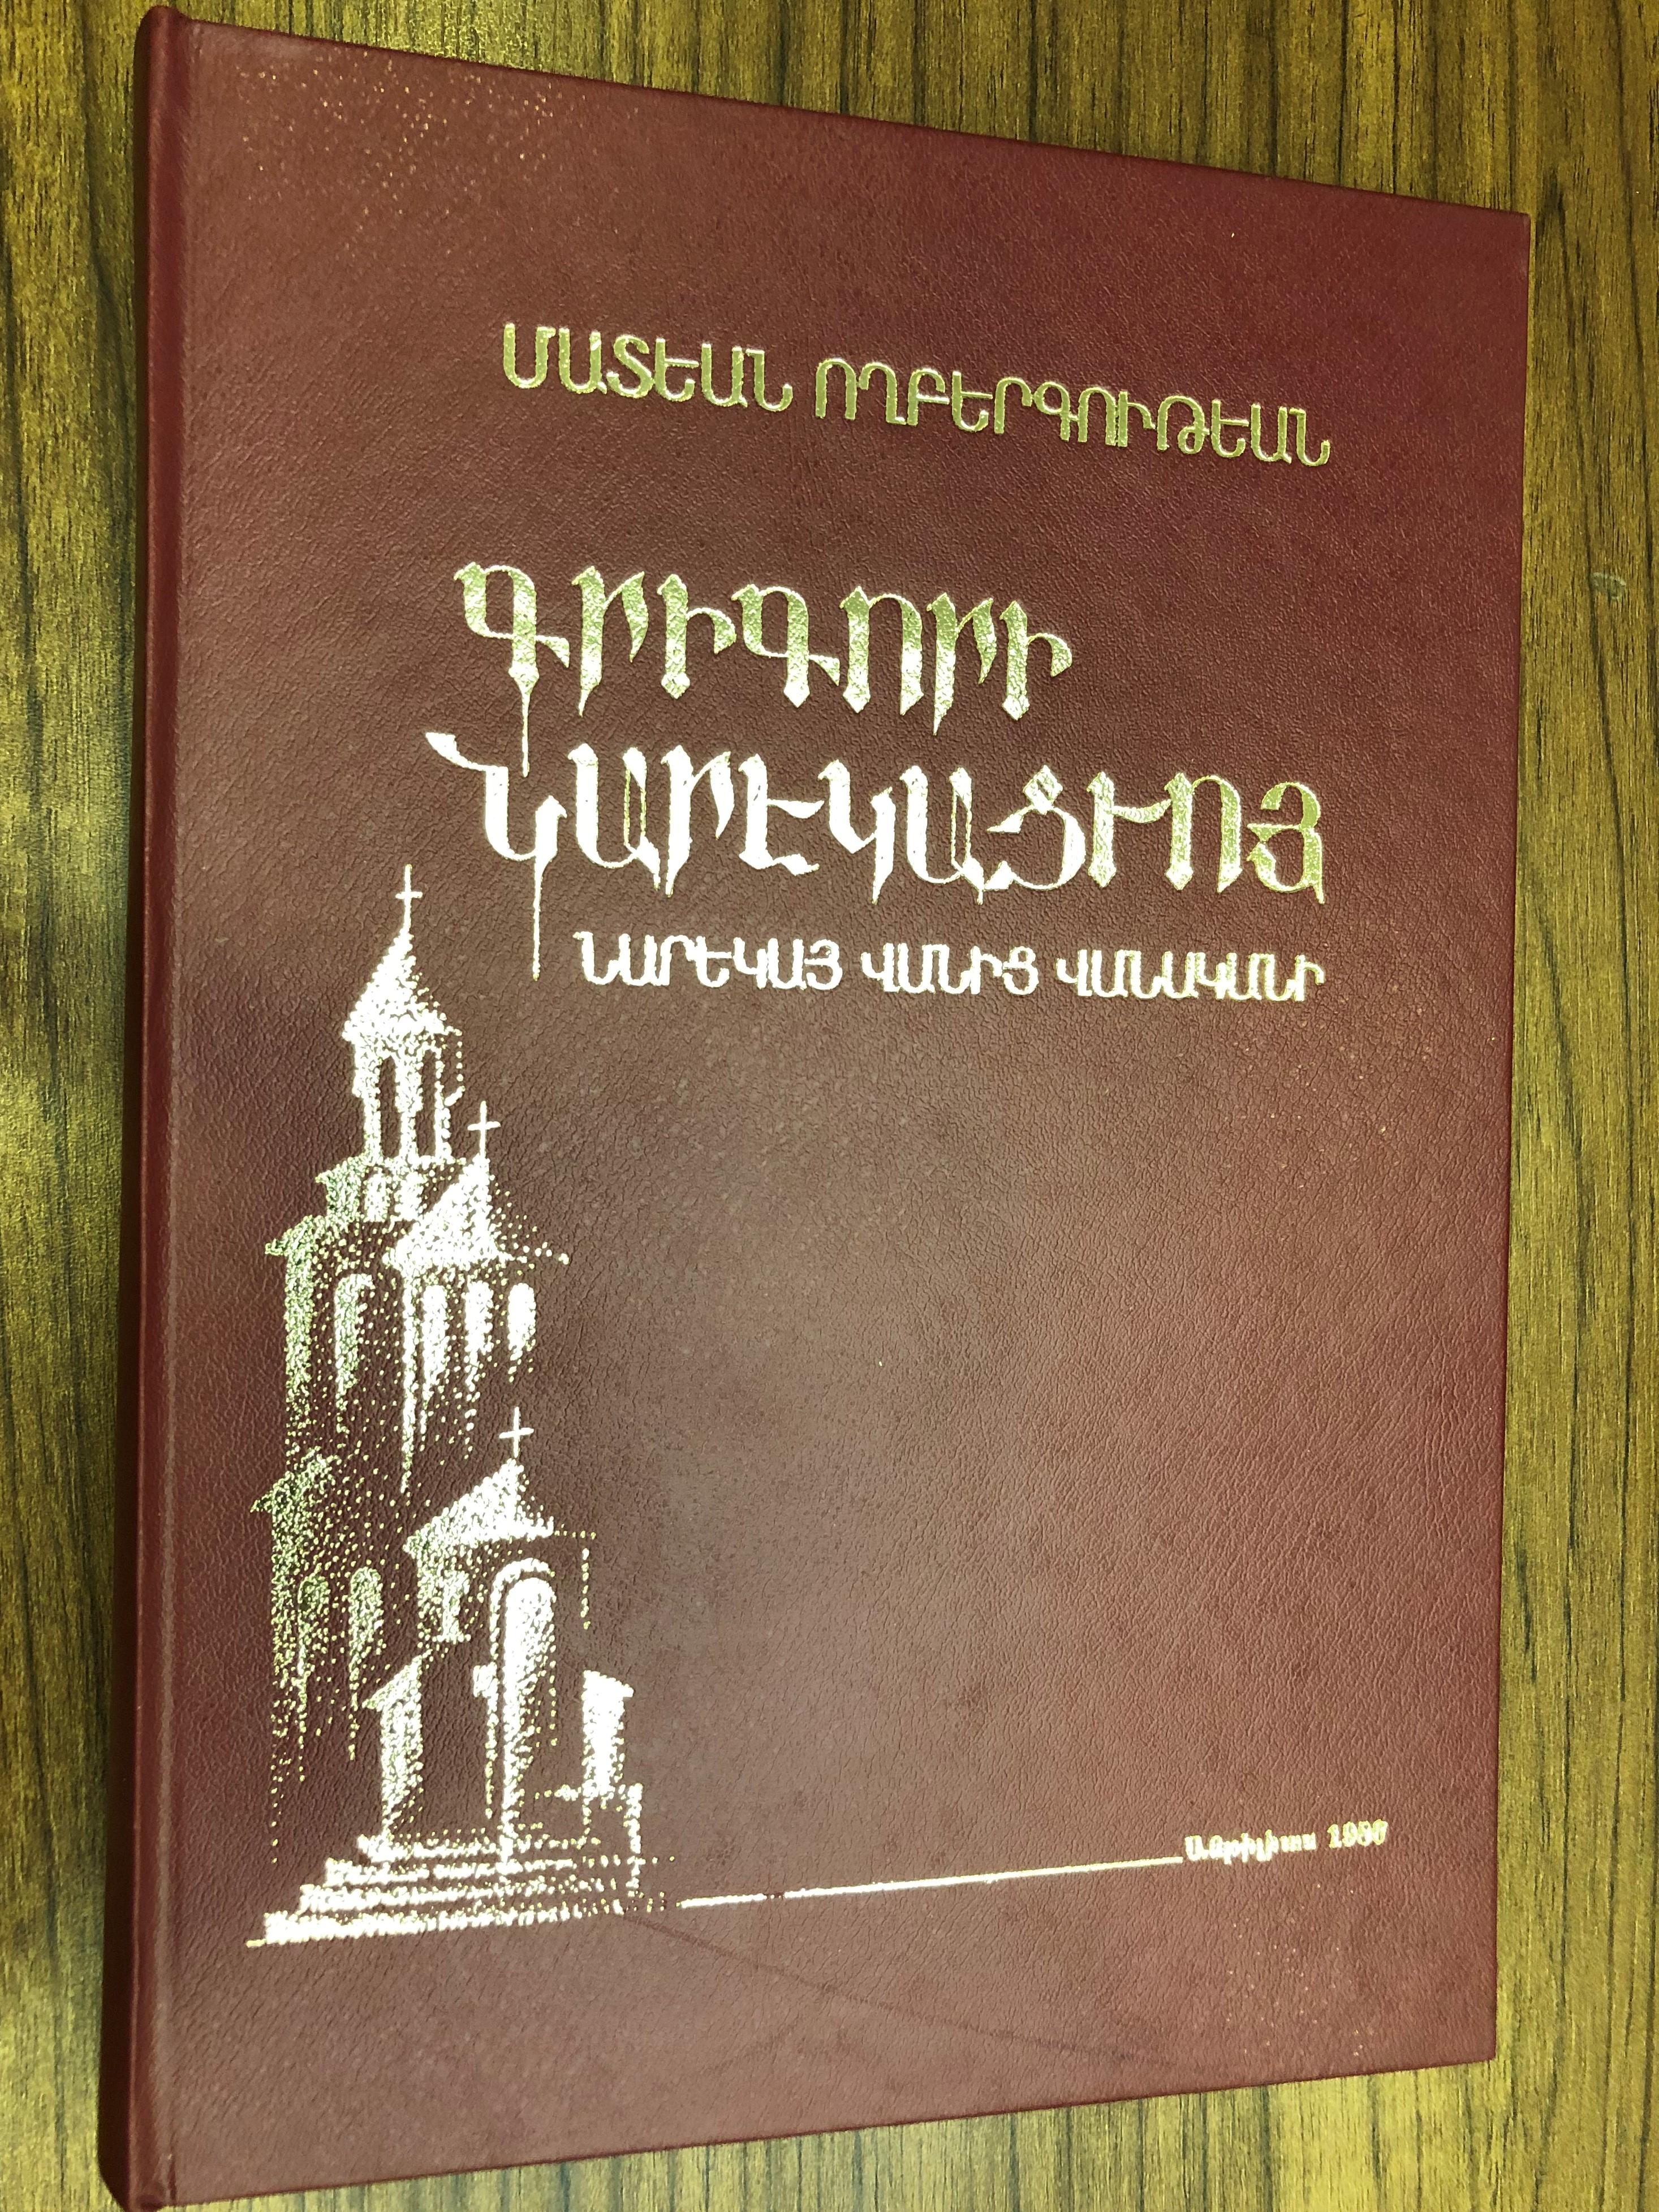 armenian-christian-prayer-book-daily-prayers-daily-devotionals-readings-hardcover-1-.jpg